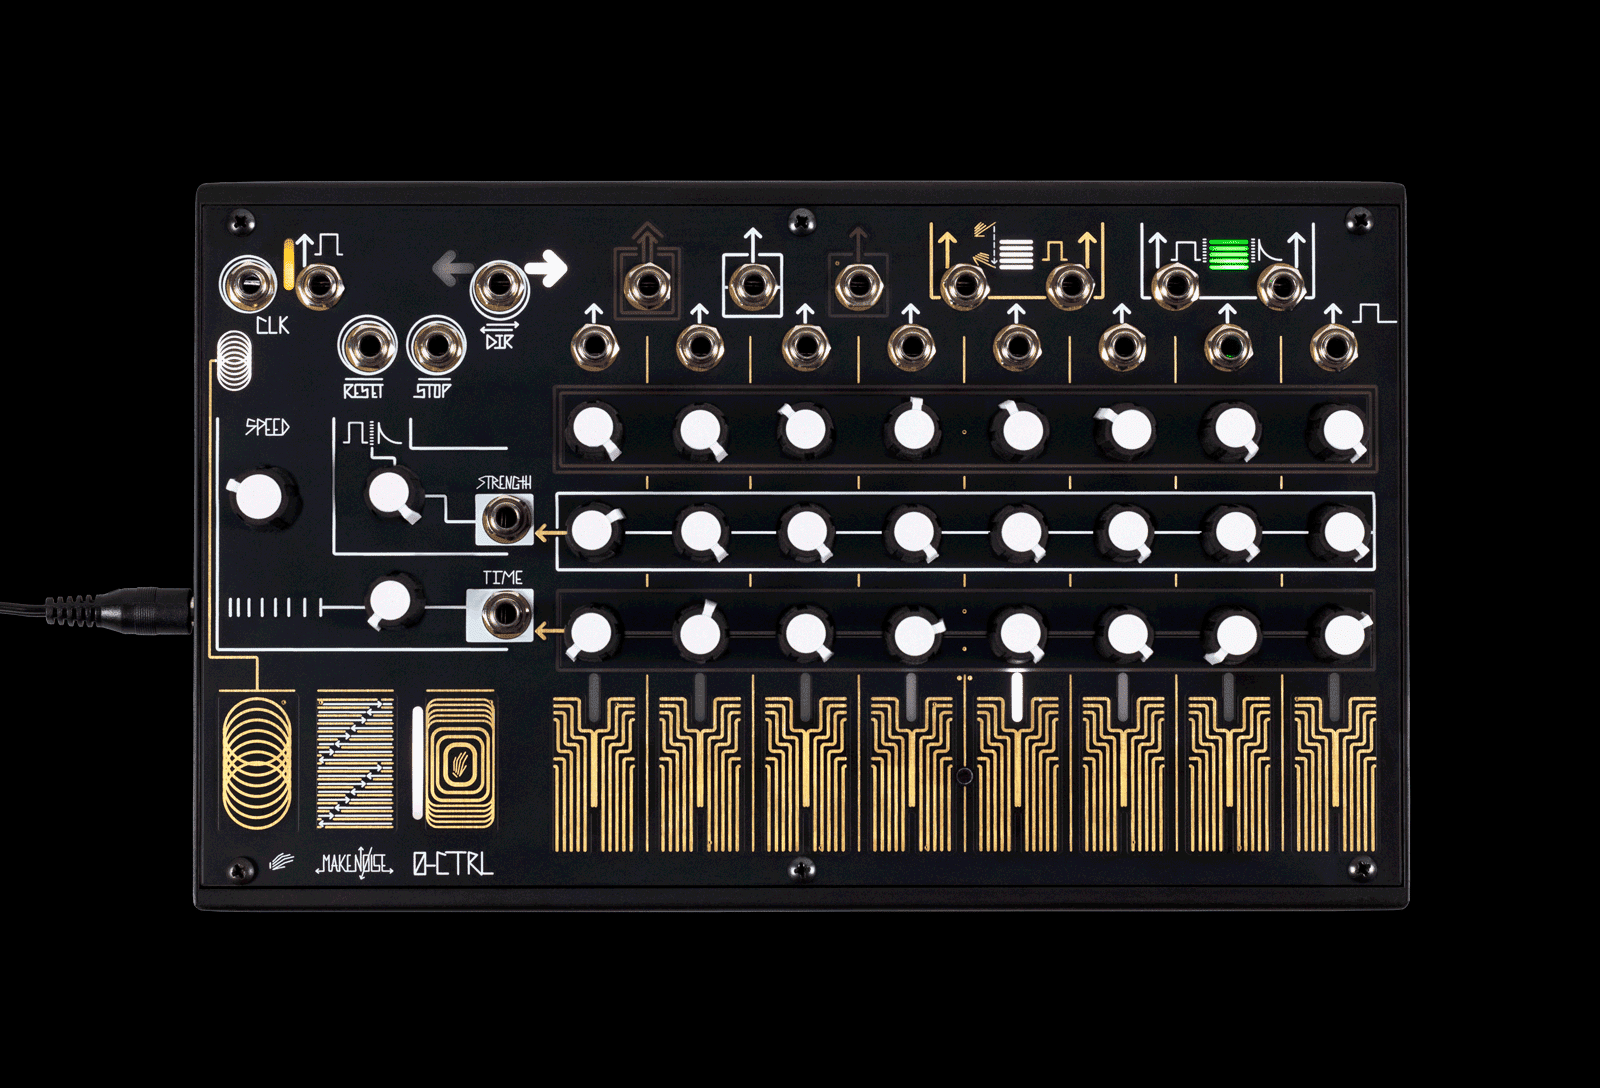 Make Noise Introduce 0-CTRL Desktop Sequencer - Attack Magazine